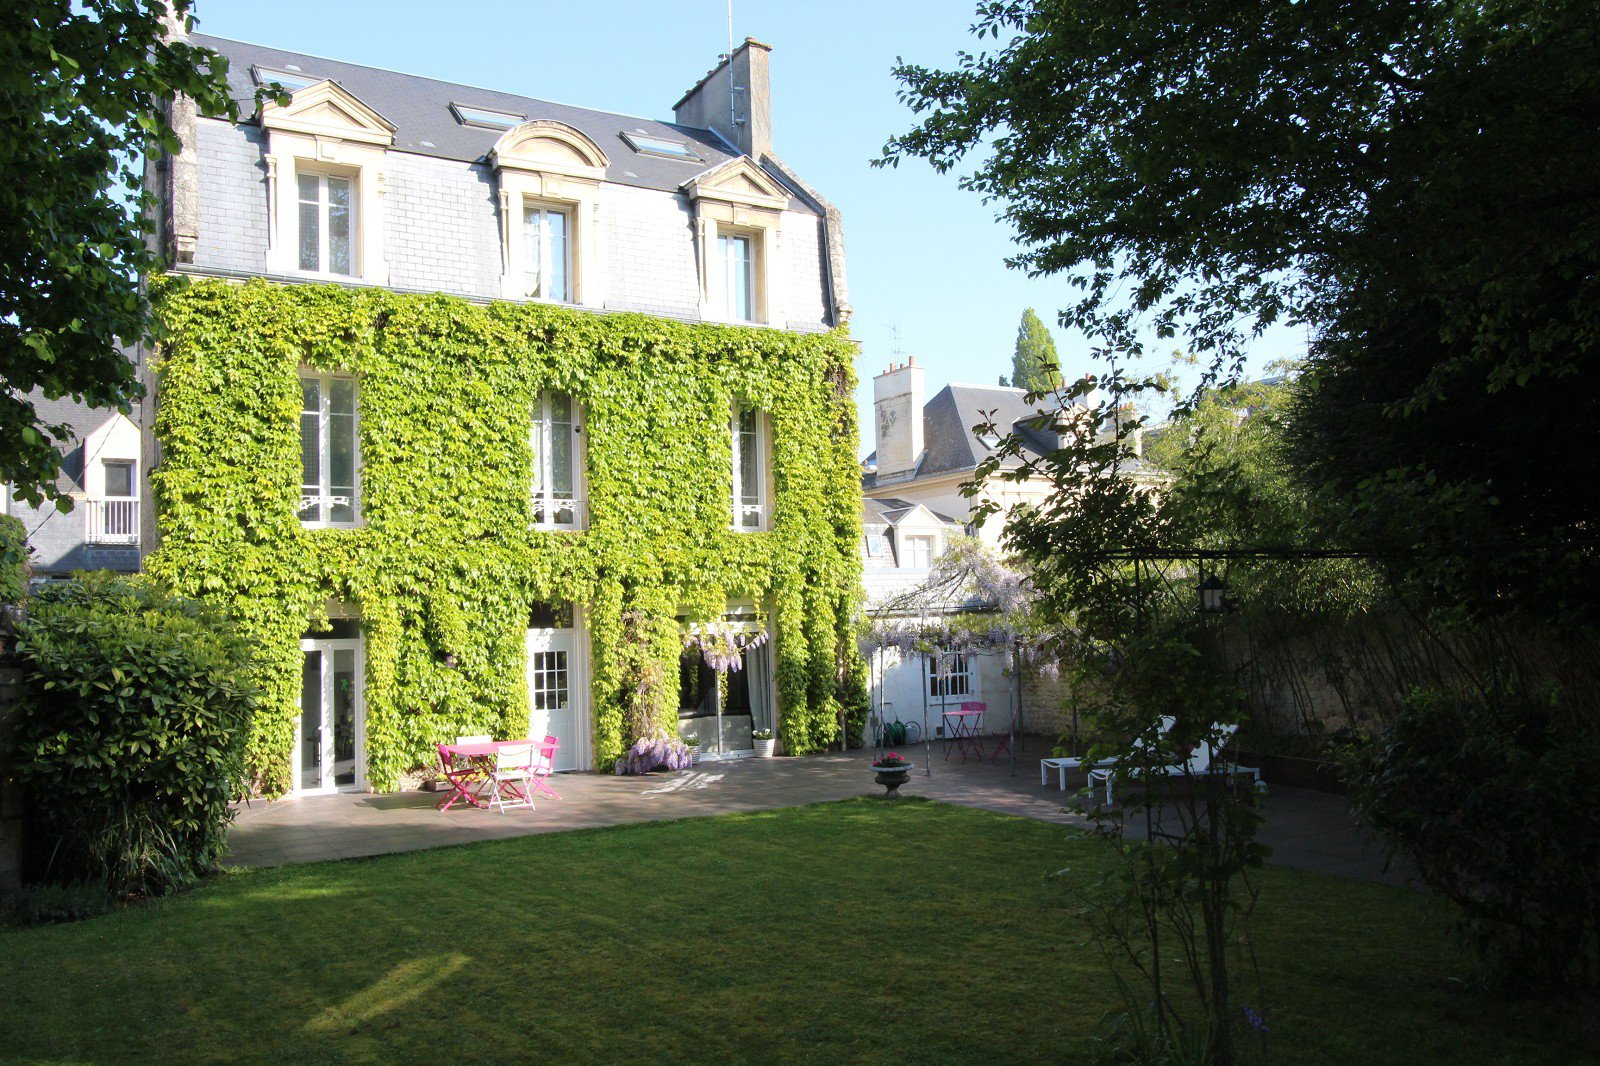 tres-belle-maison-bourgeoise-xixeme-siecle-charmes-antan-a-vendre-caen-cheminee-terrasse-garage